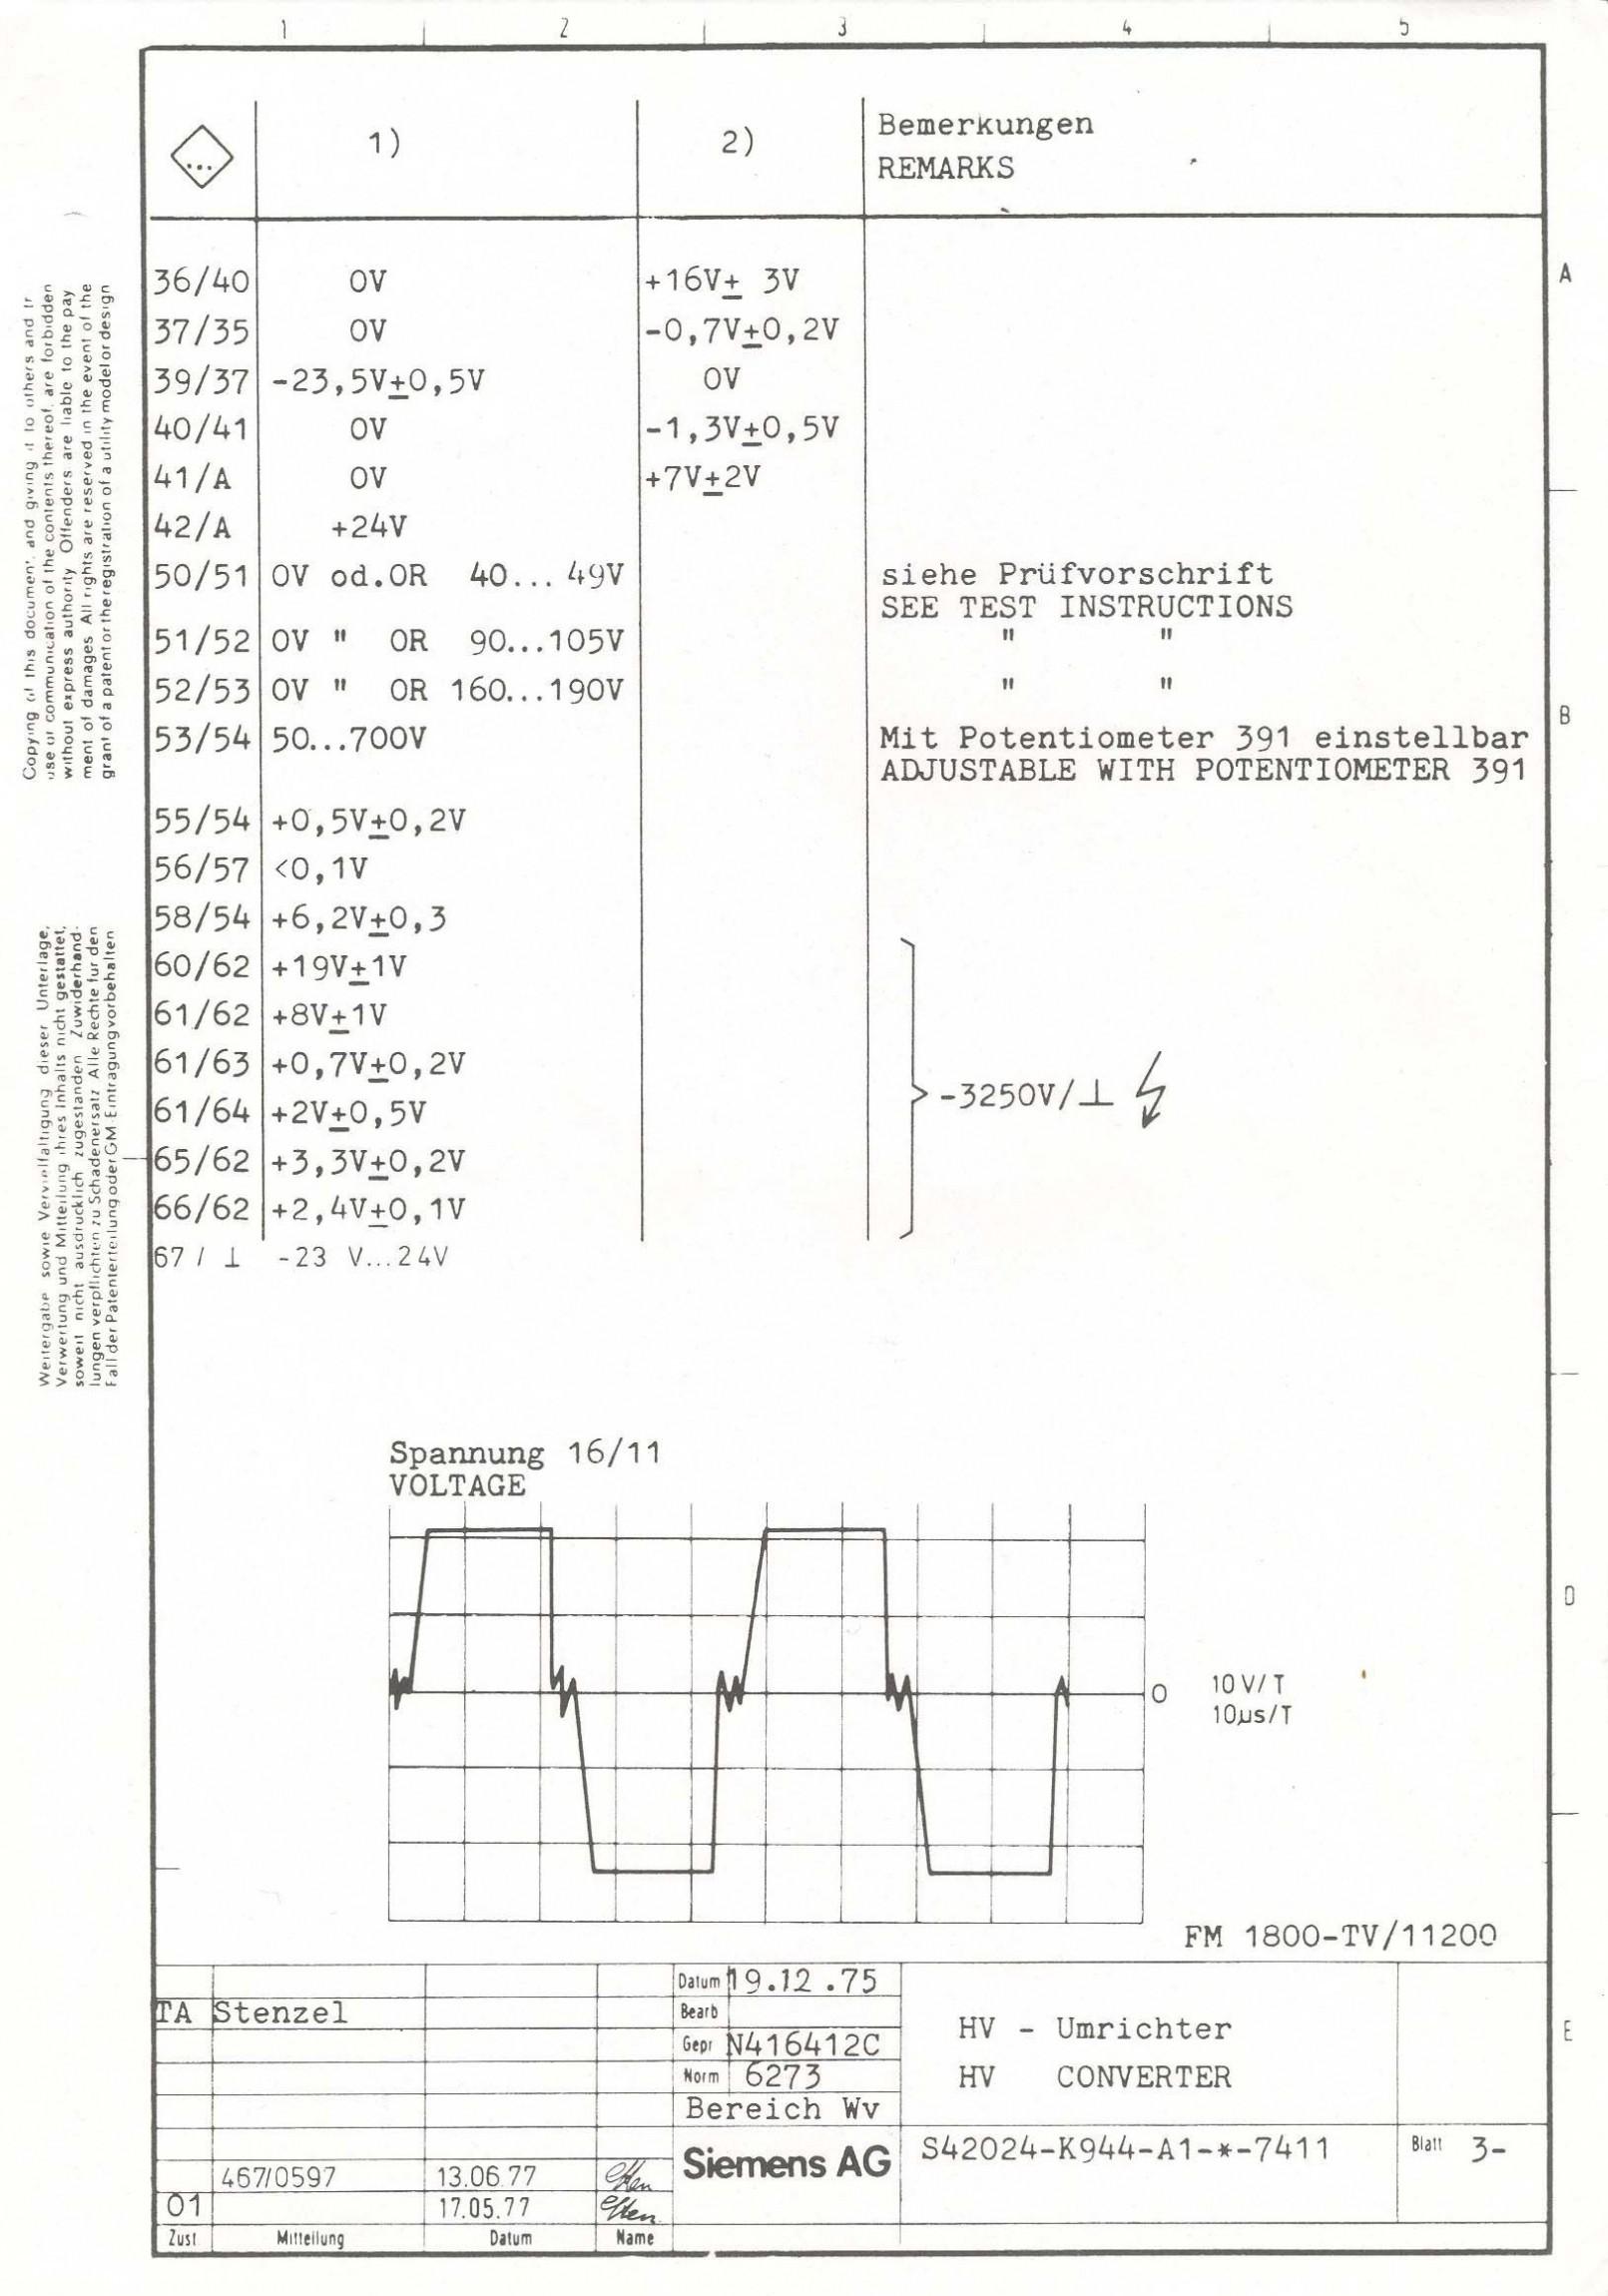 50 Amp Rv Plug Wiring Diagram 50 Amp Twist Lock Plug Wiring ...  Amp Twist Lock Wiring Diagram on